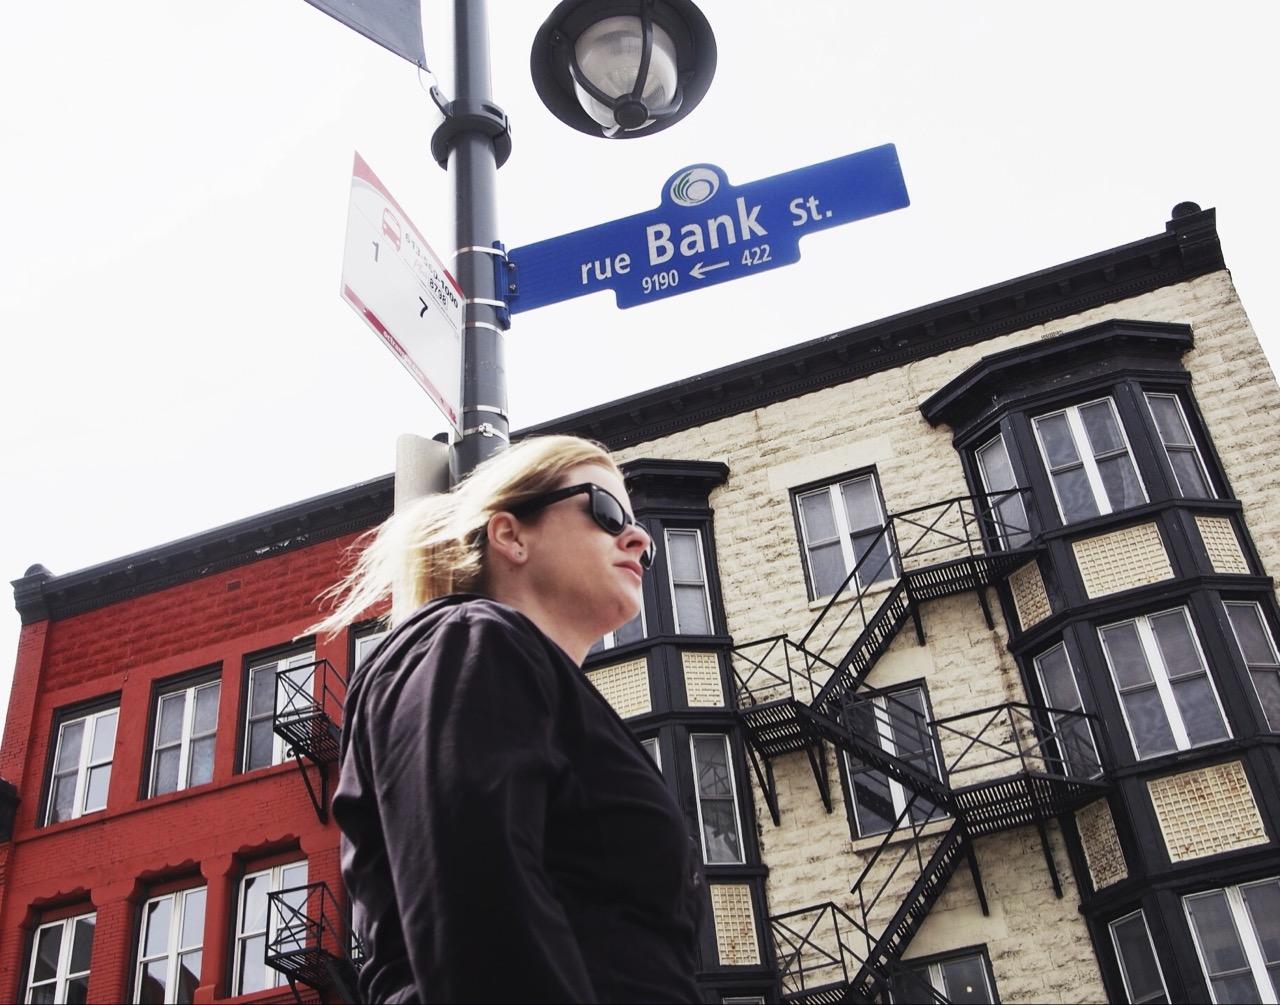 Bank St.